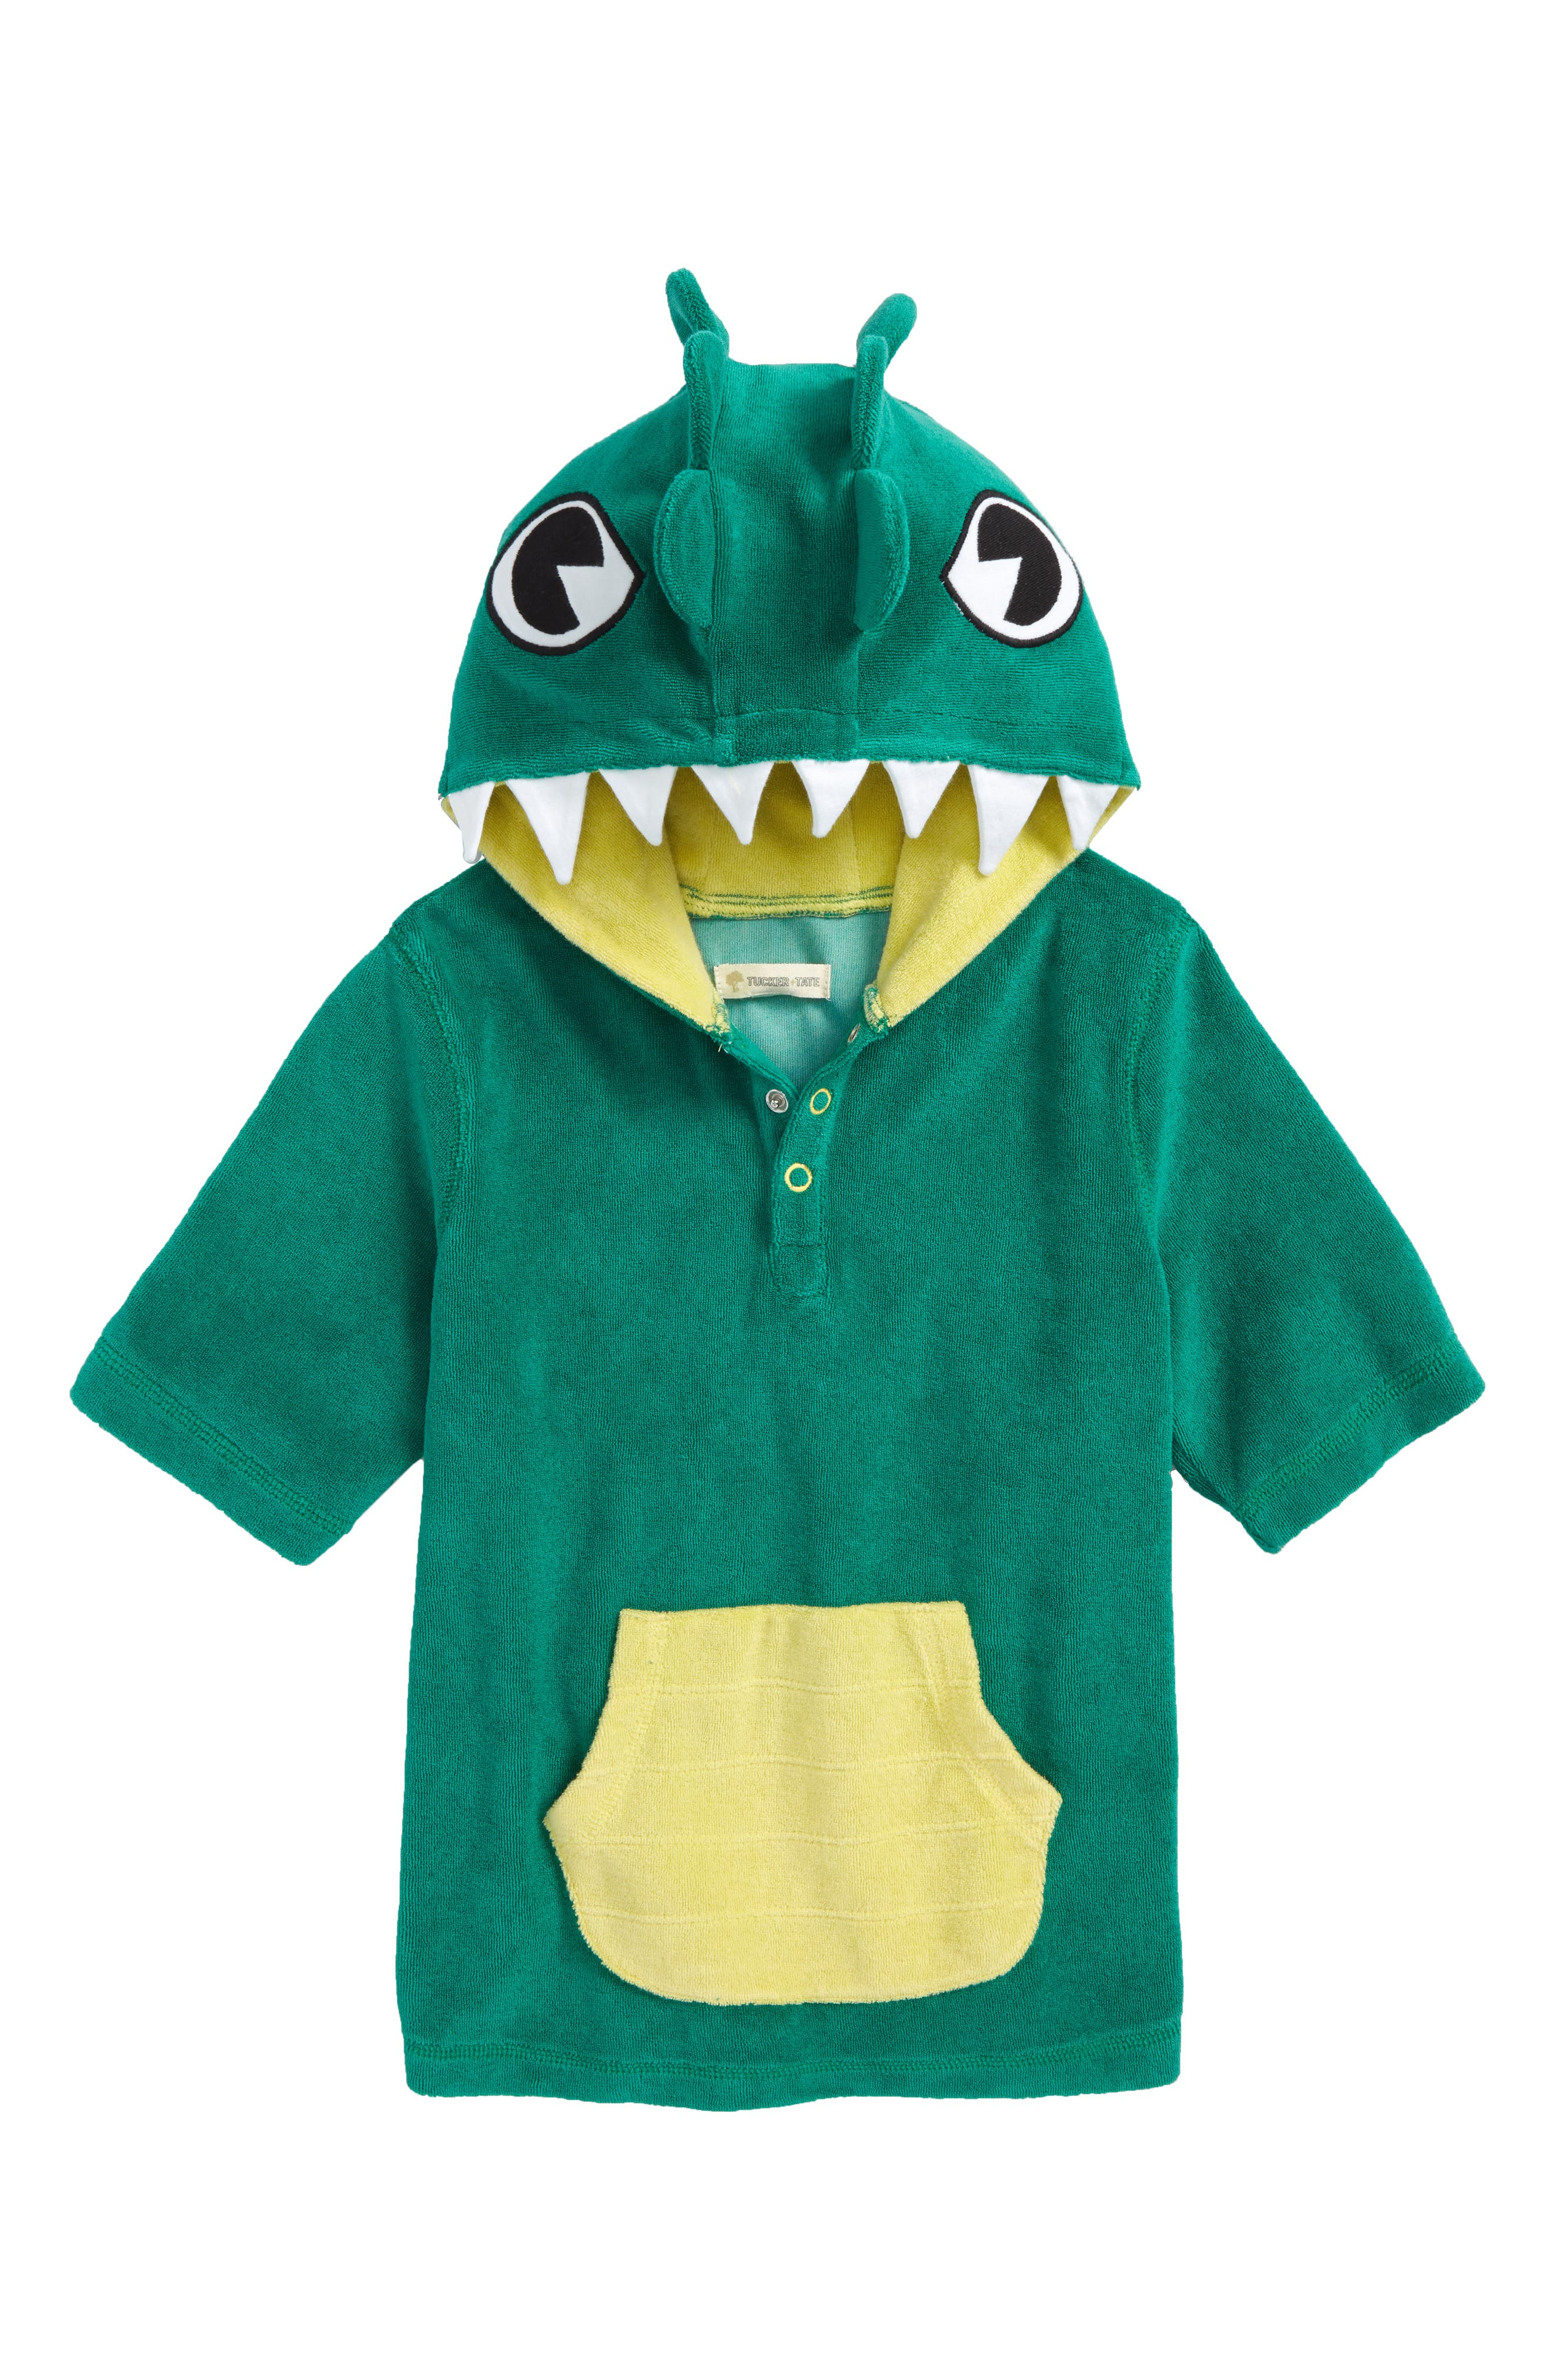 Tucker + Tate Green Lake Gator Towel Cover-Up (Toddler Boys & Little Boys)